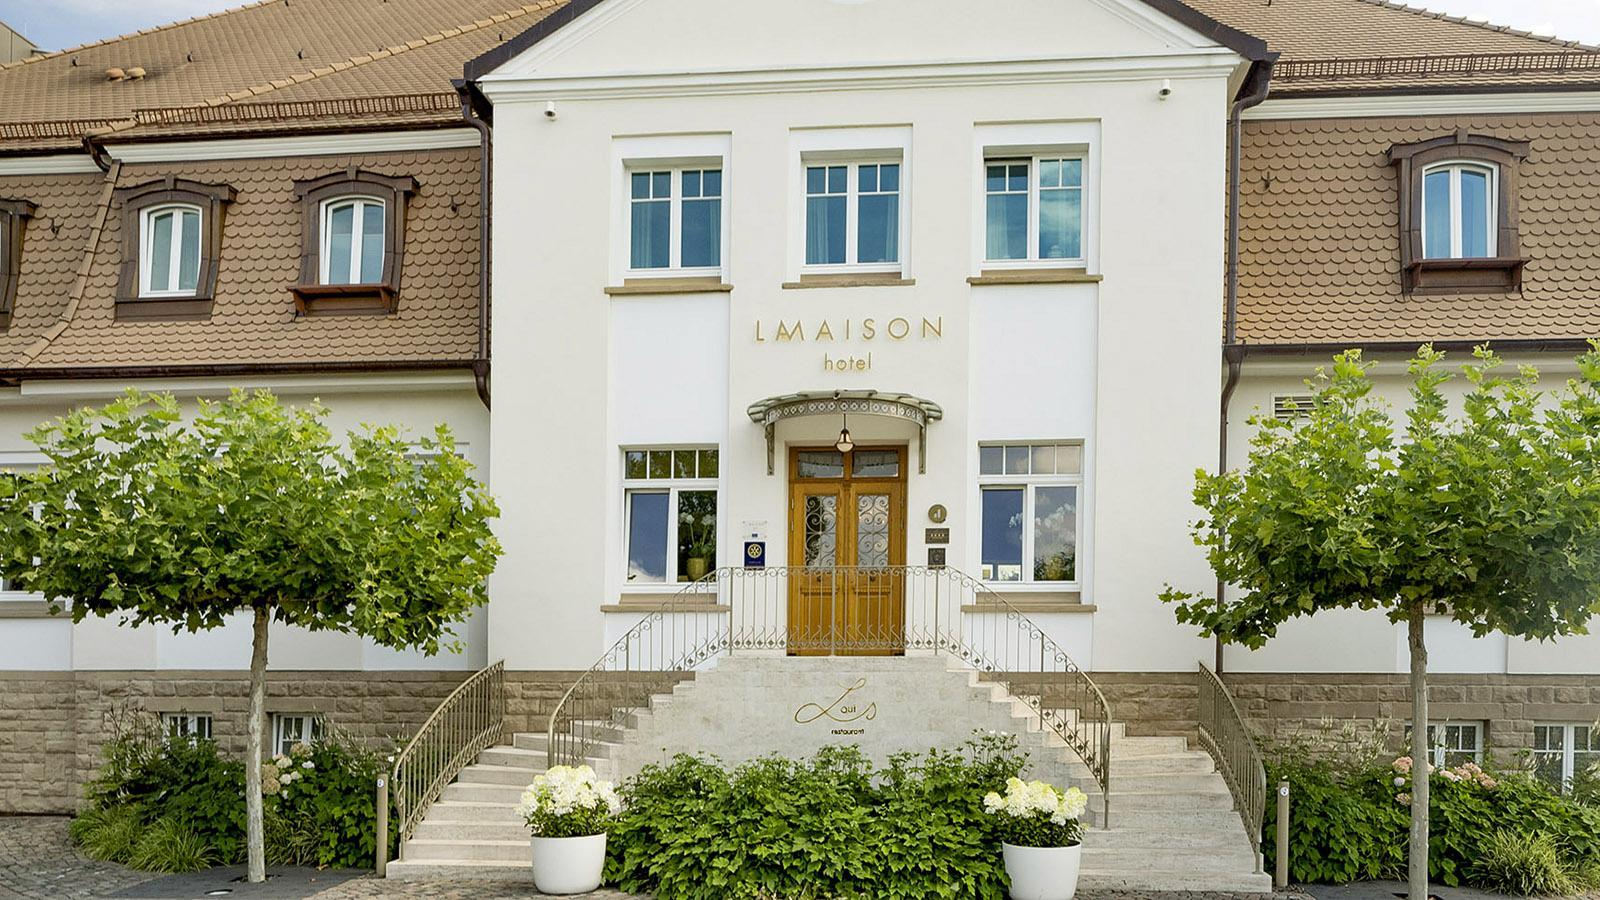 La Maison. Foto: Pressebild, Stromberger PR. Fotograf: Dirk Meyer